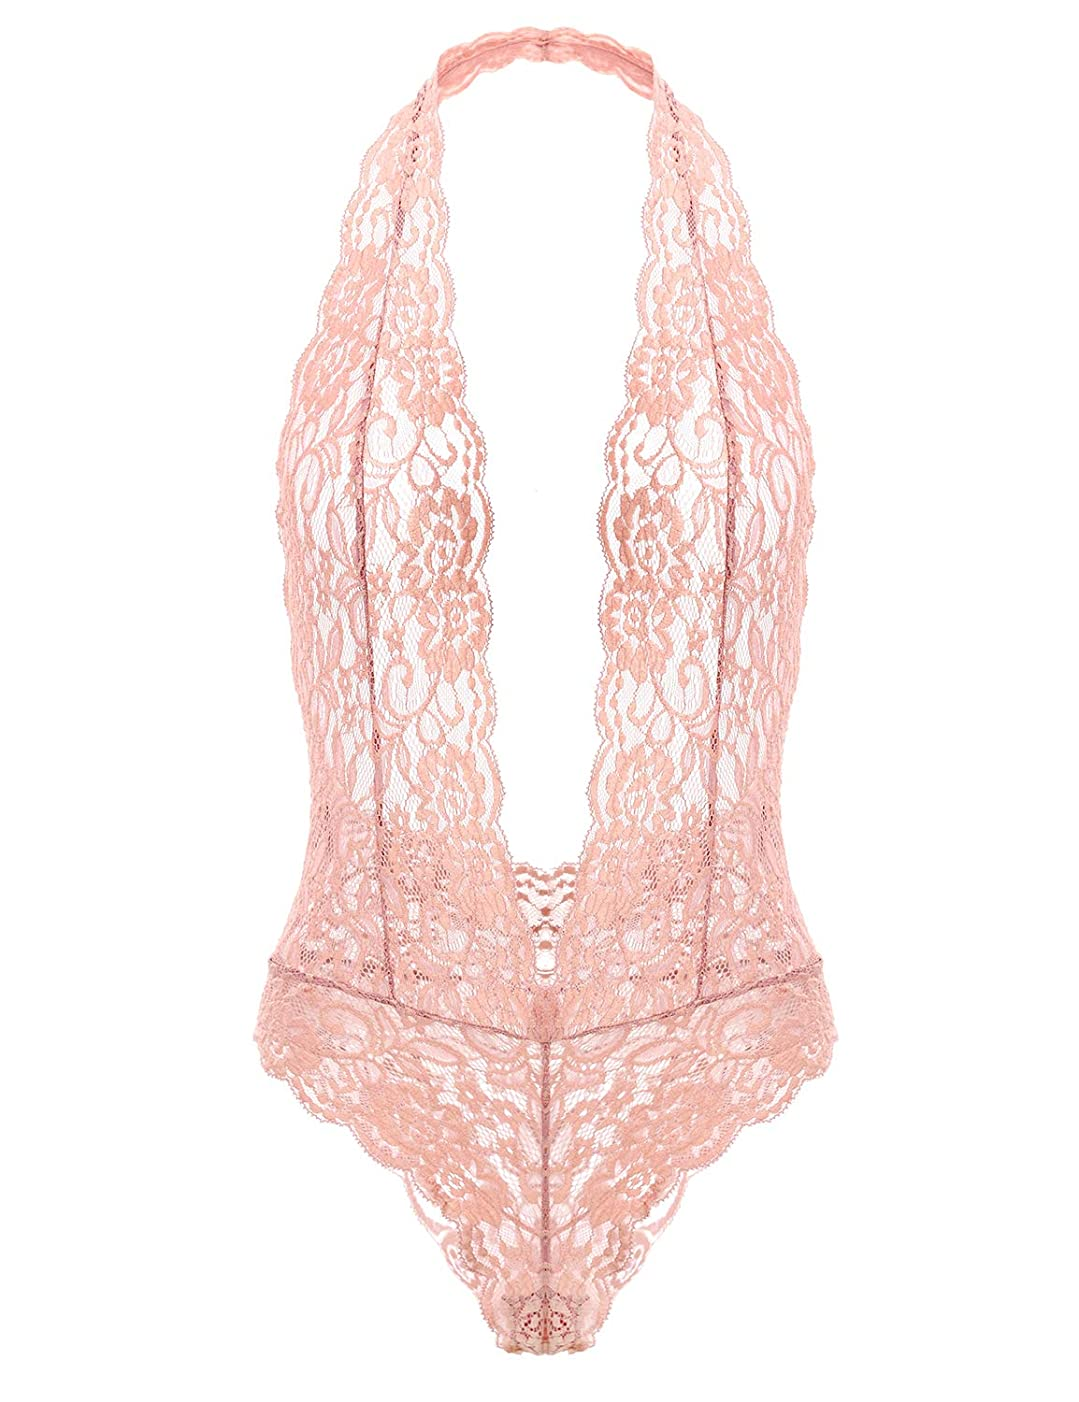 Garmol Women's Deep V Plunging Teddy Lingerie Halter Lace Babydoll Bodysuit